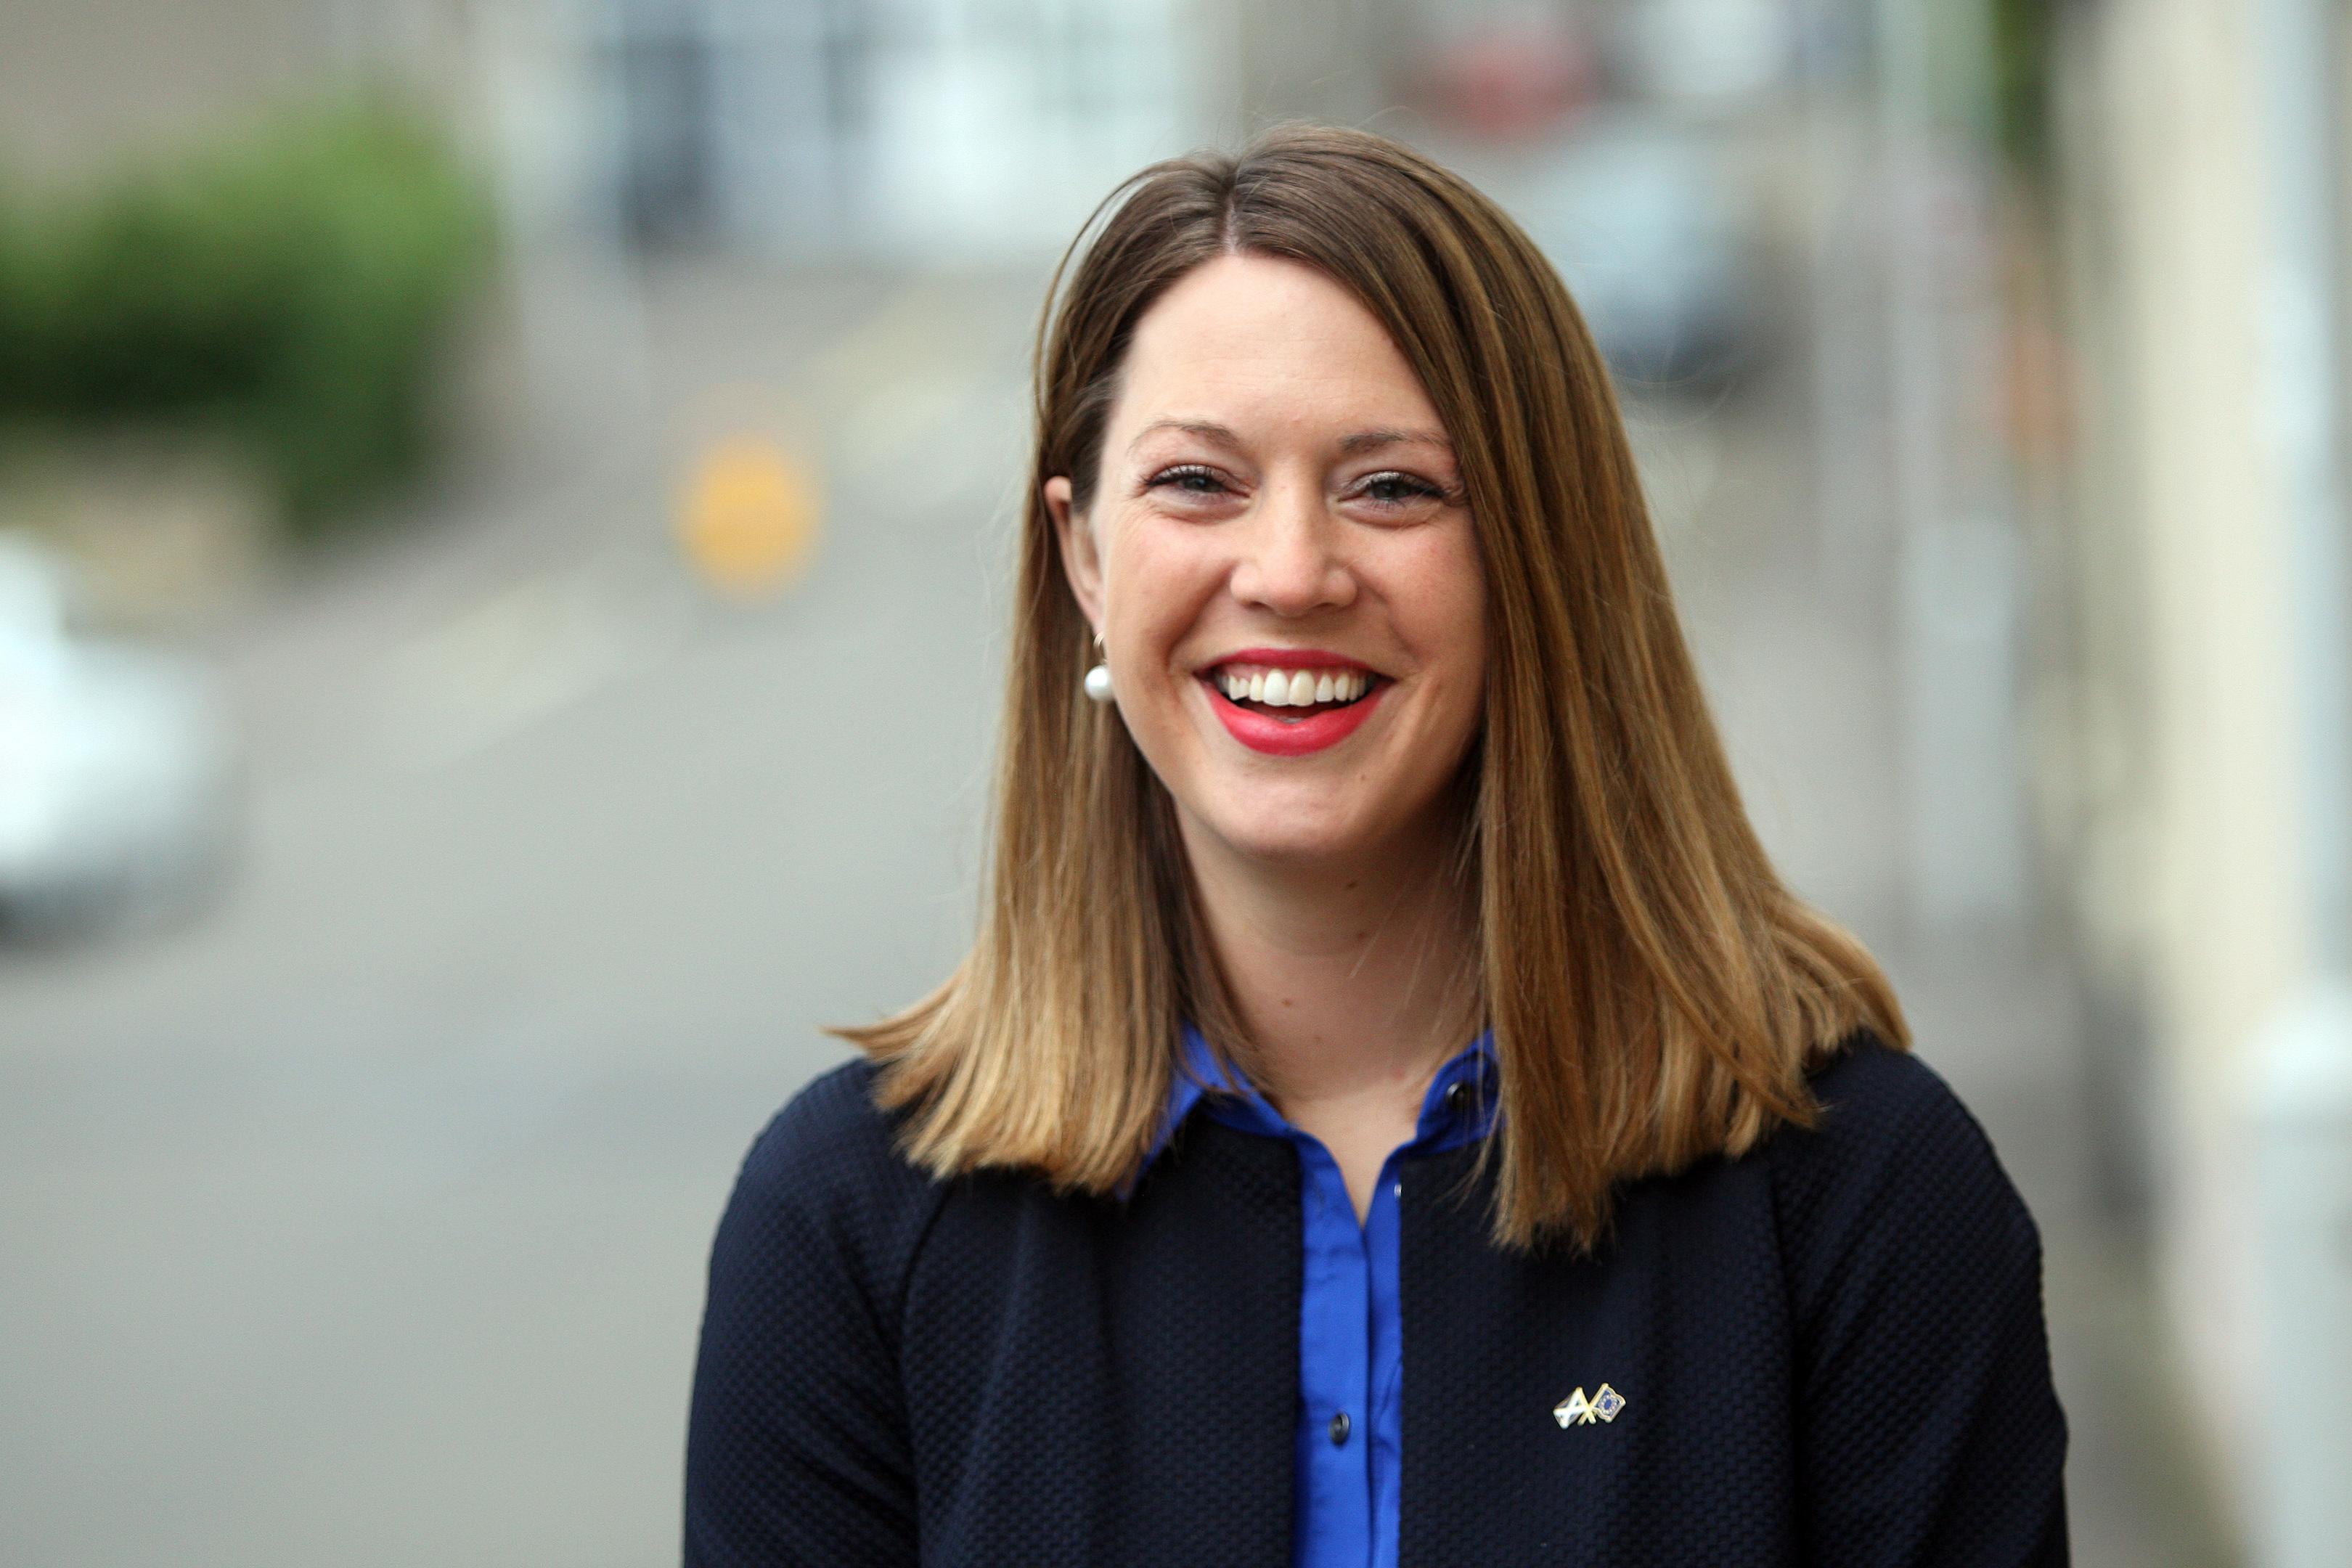 Glenrothes MSP Jenny Gilruth